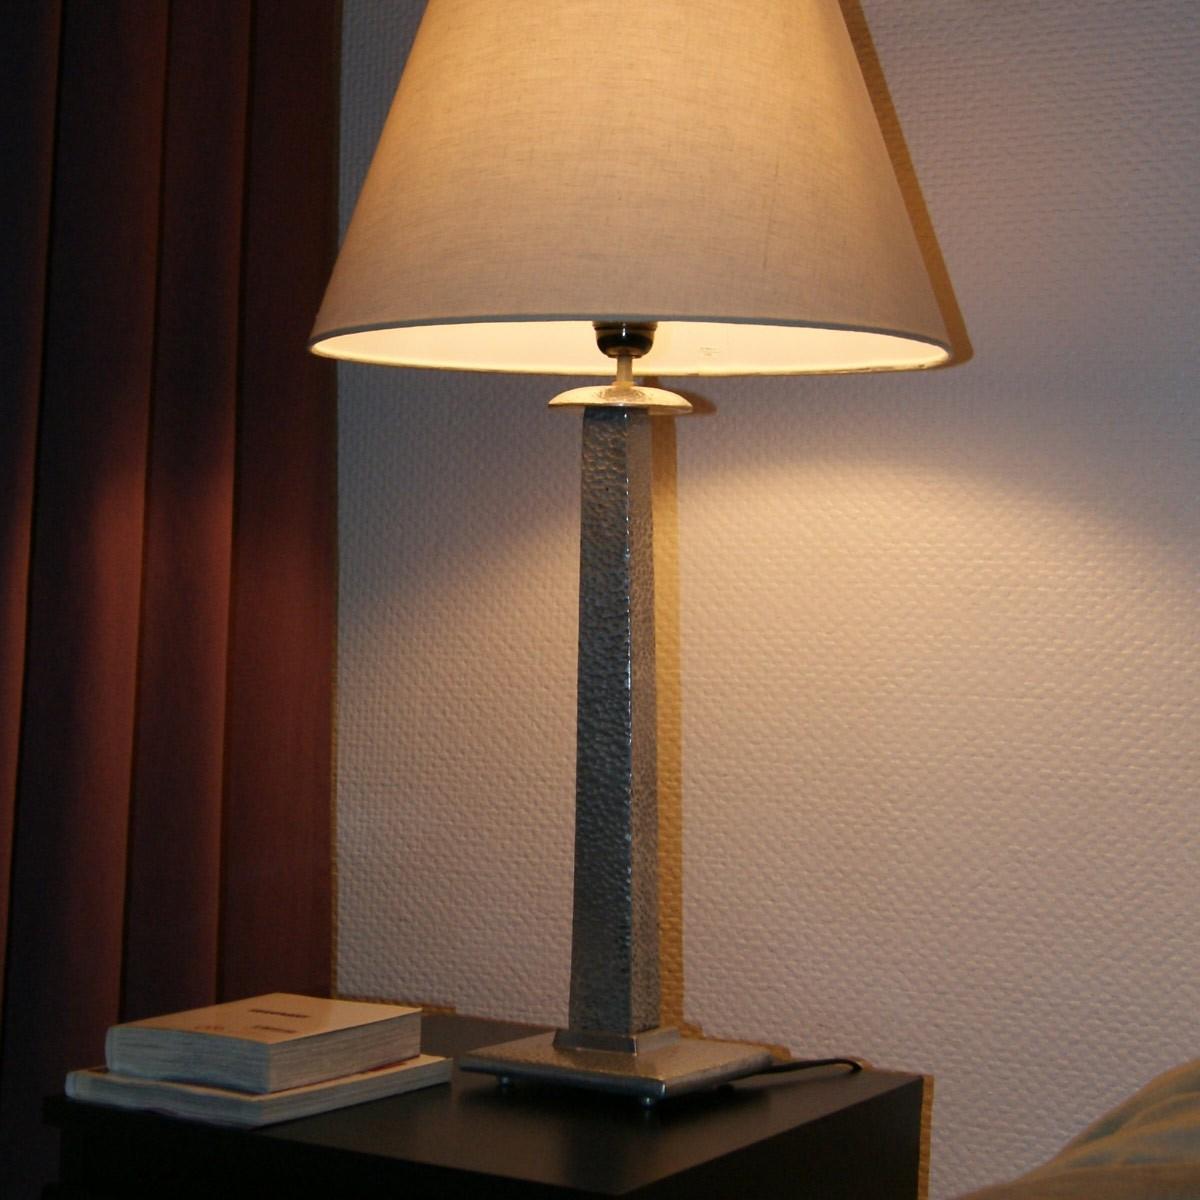 pied de lampe m tal aluminium martel. Black Bedroom Furniture Sets. Home Design Ideas